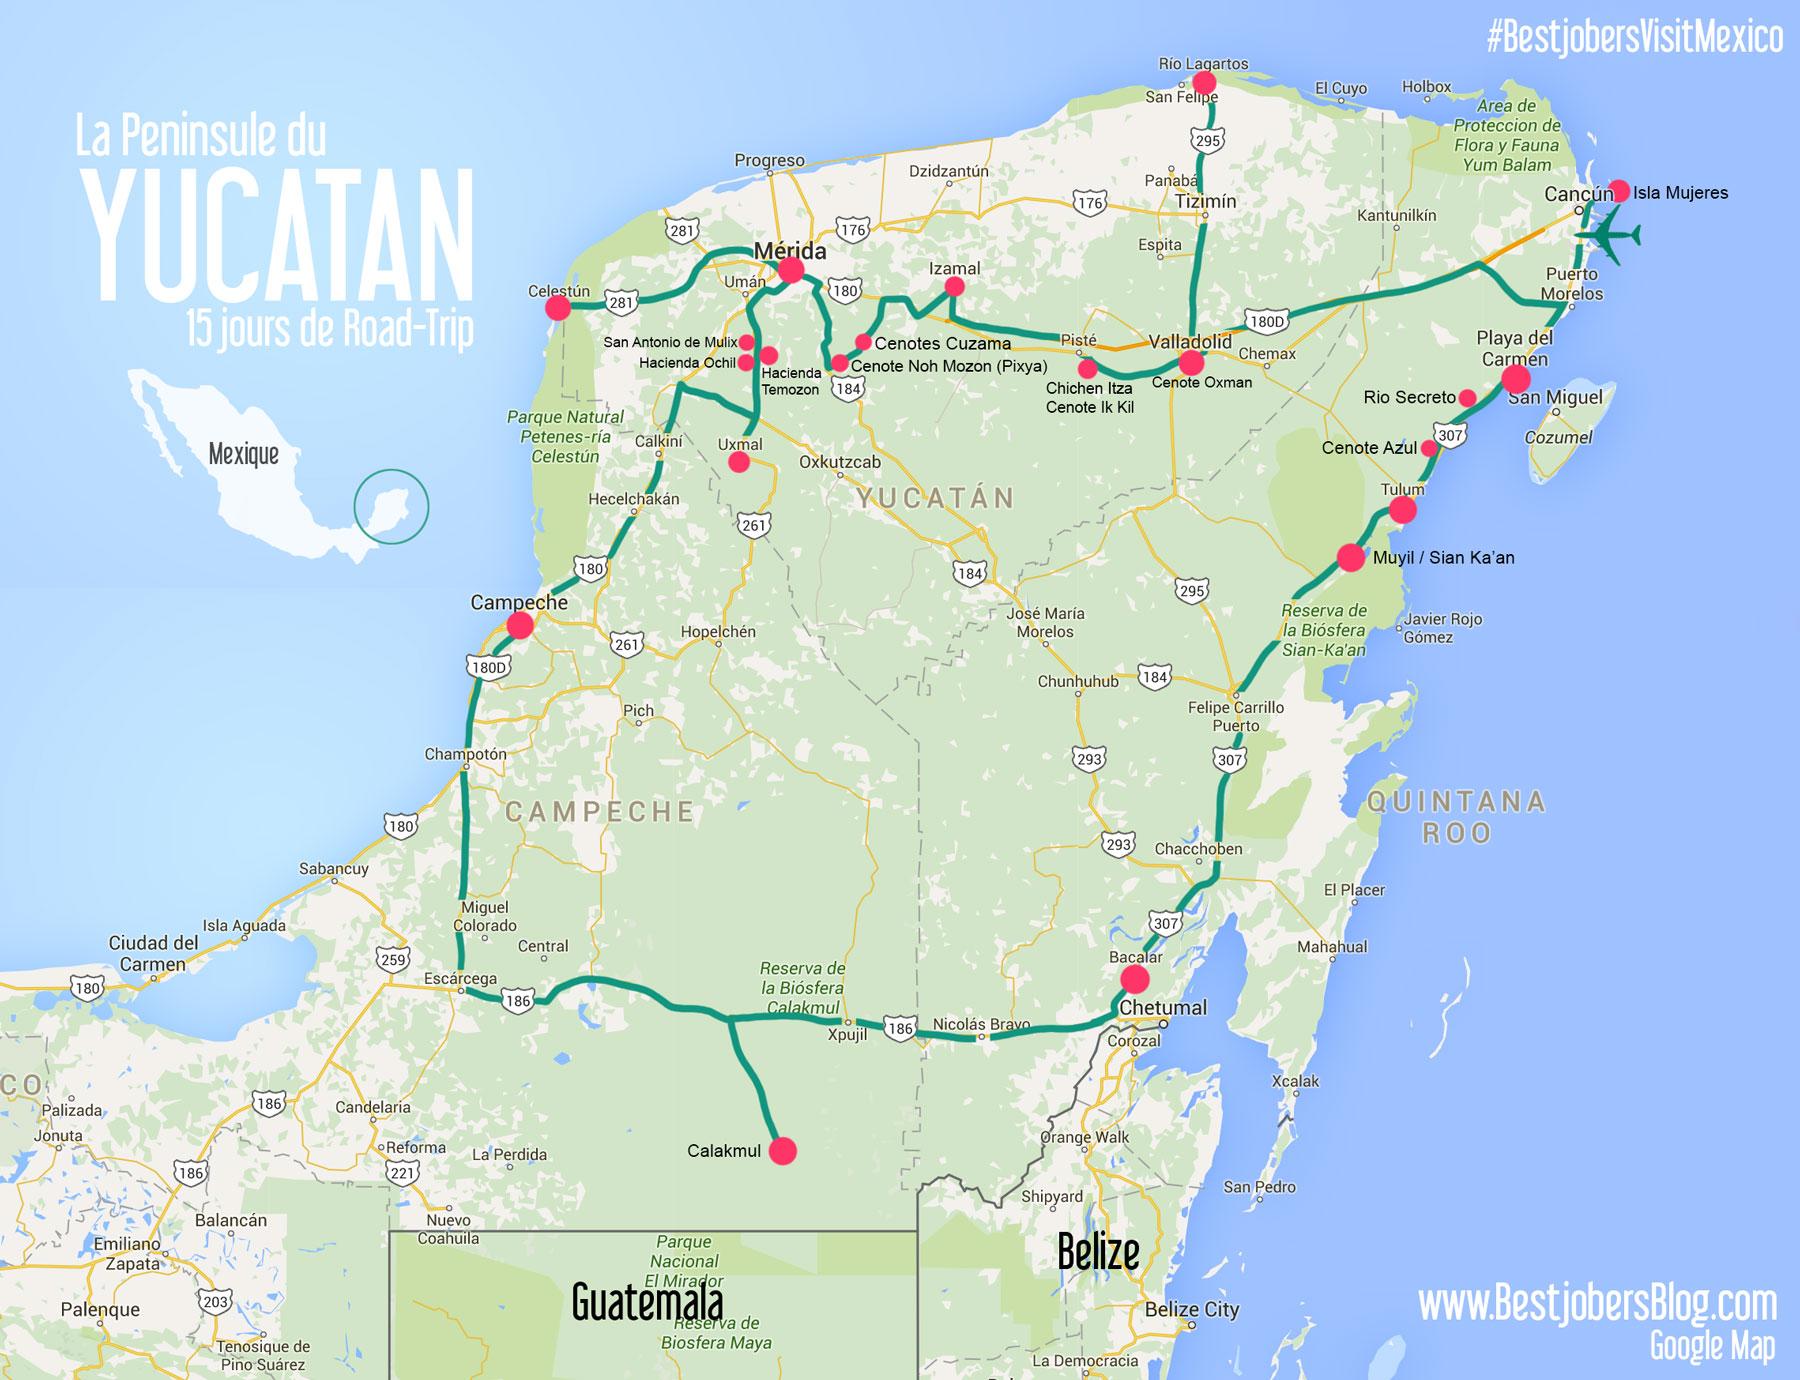 Road-trip Yucatan carte détaillée Bestjobers